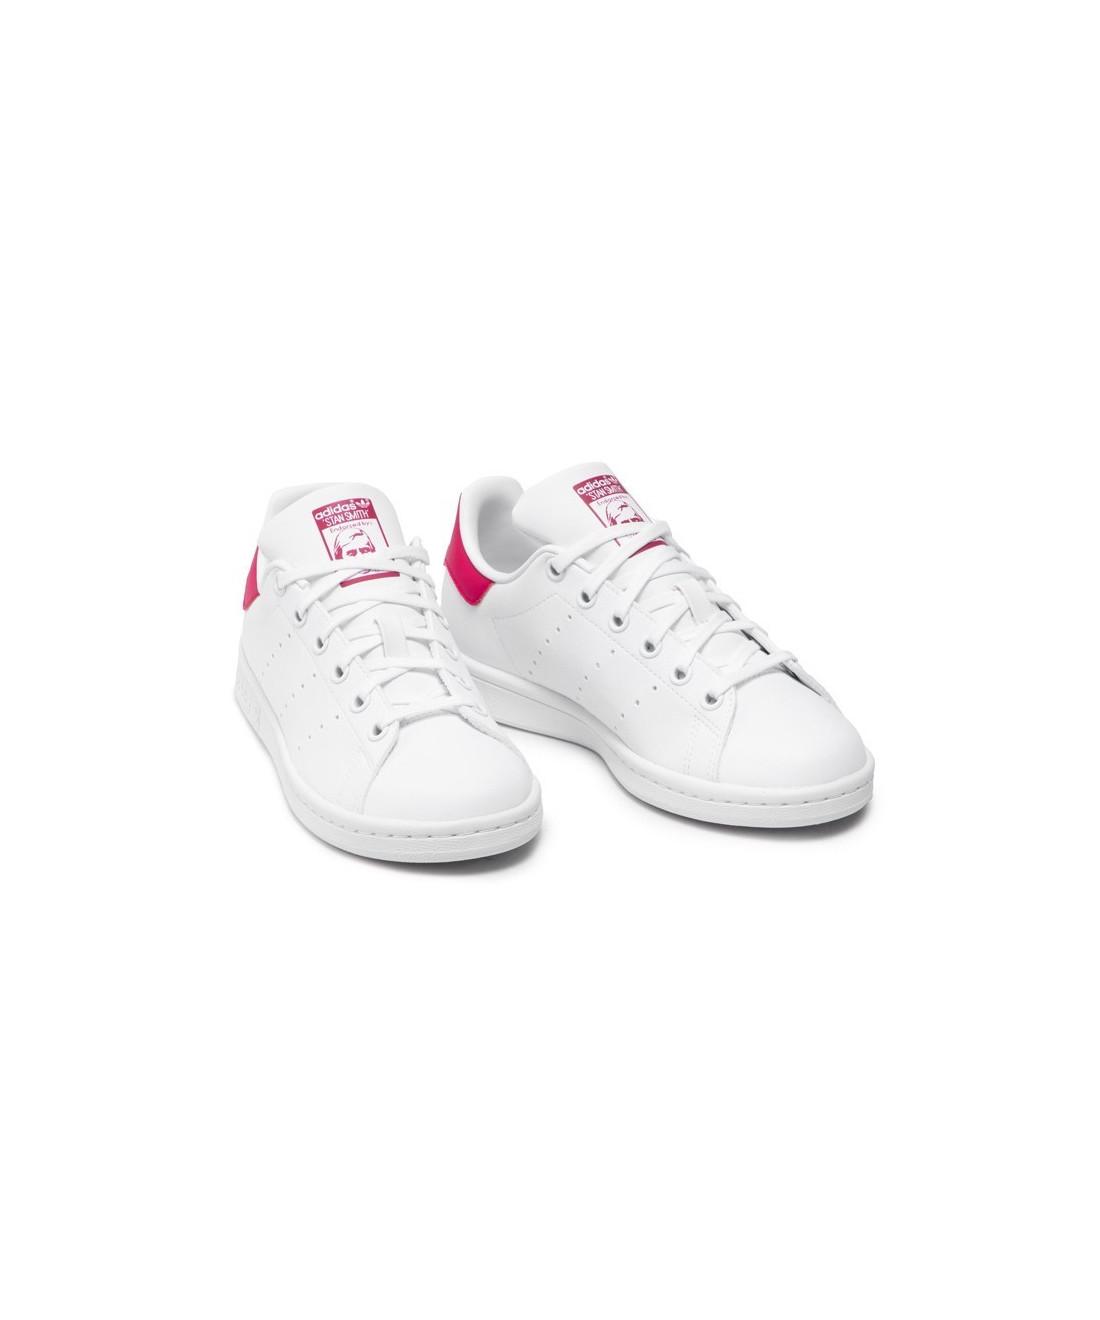 Adidas Stan Smith Blanc/Rose FX7522